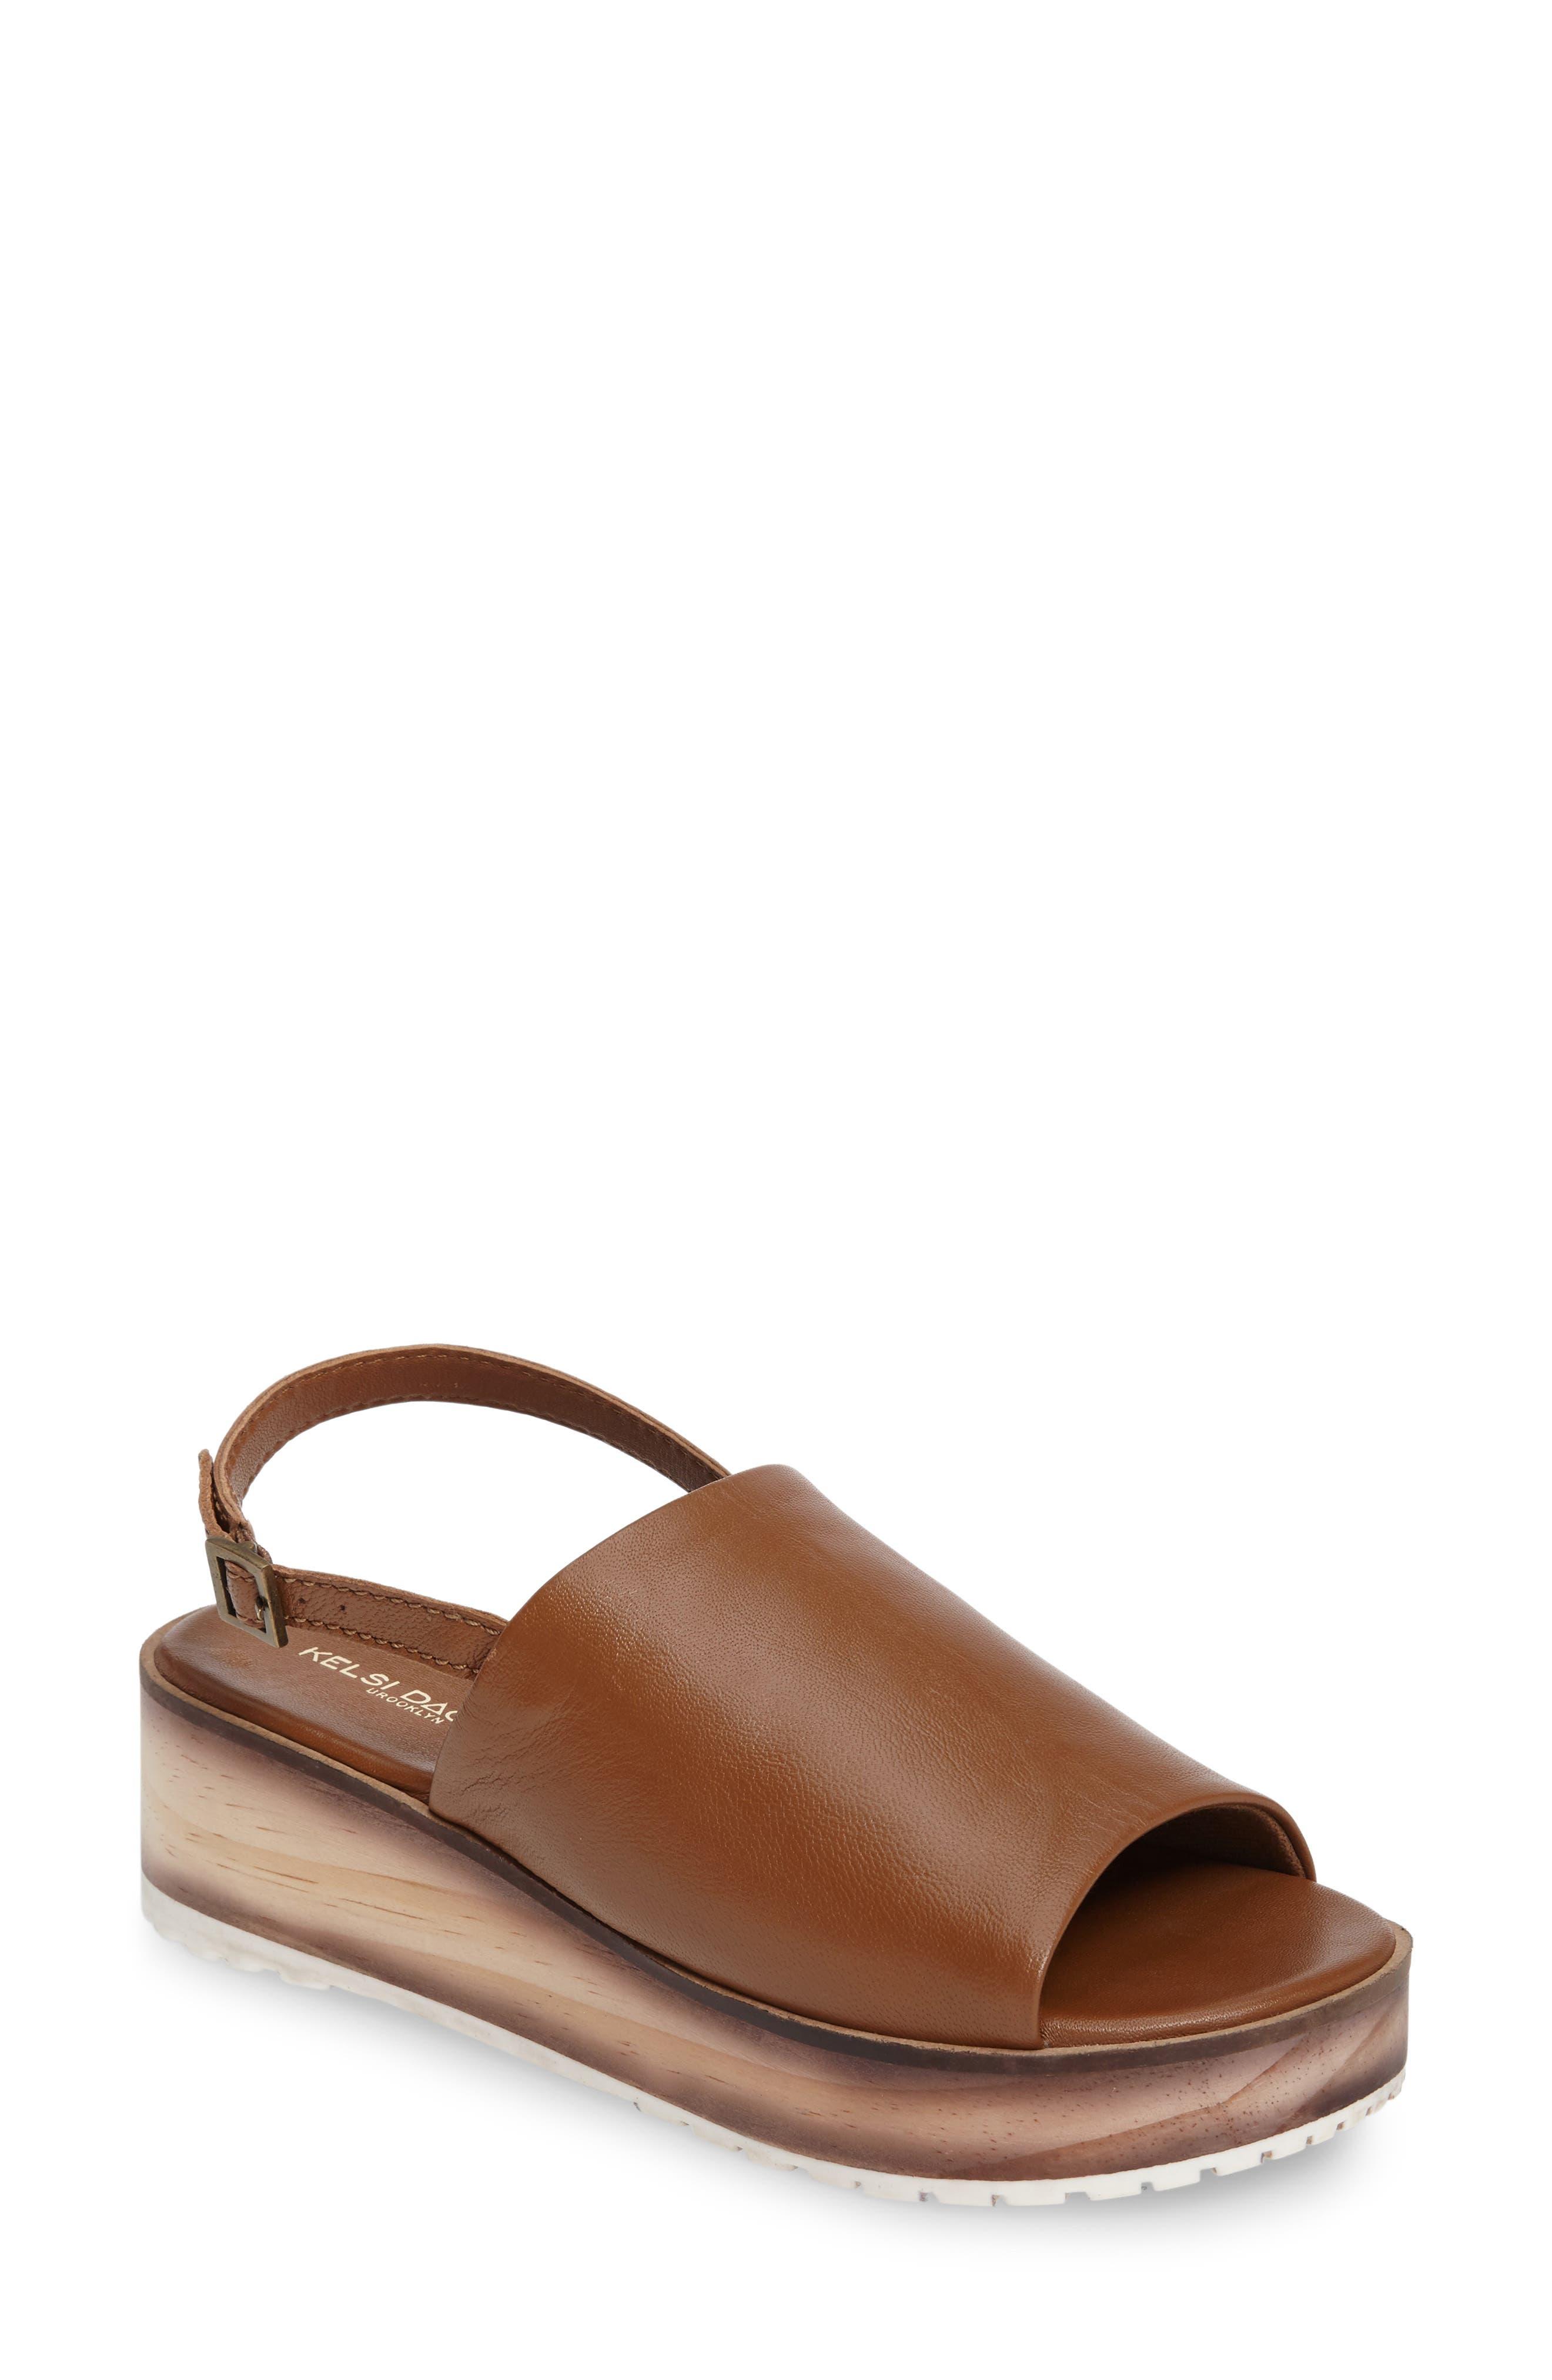 KELSI DAGGER BROOKLYN Dumont Slingback Sandal